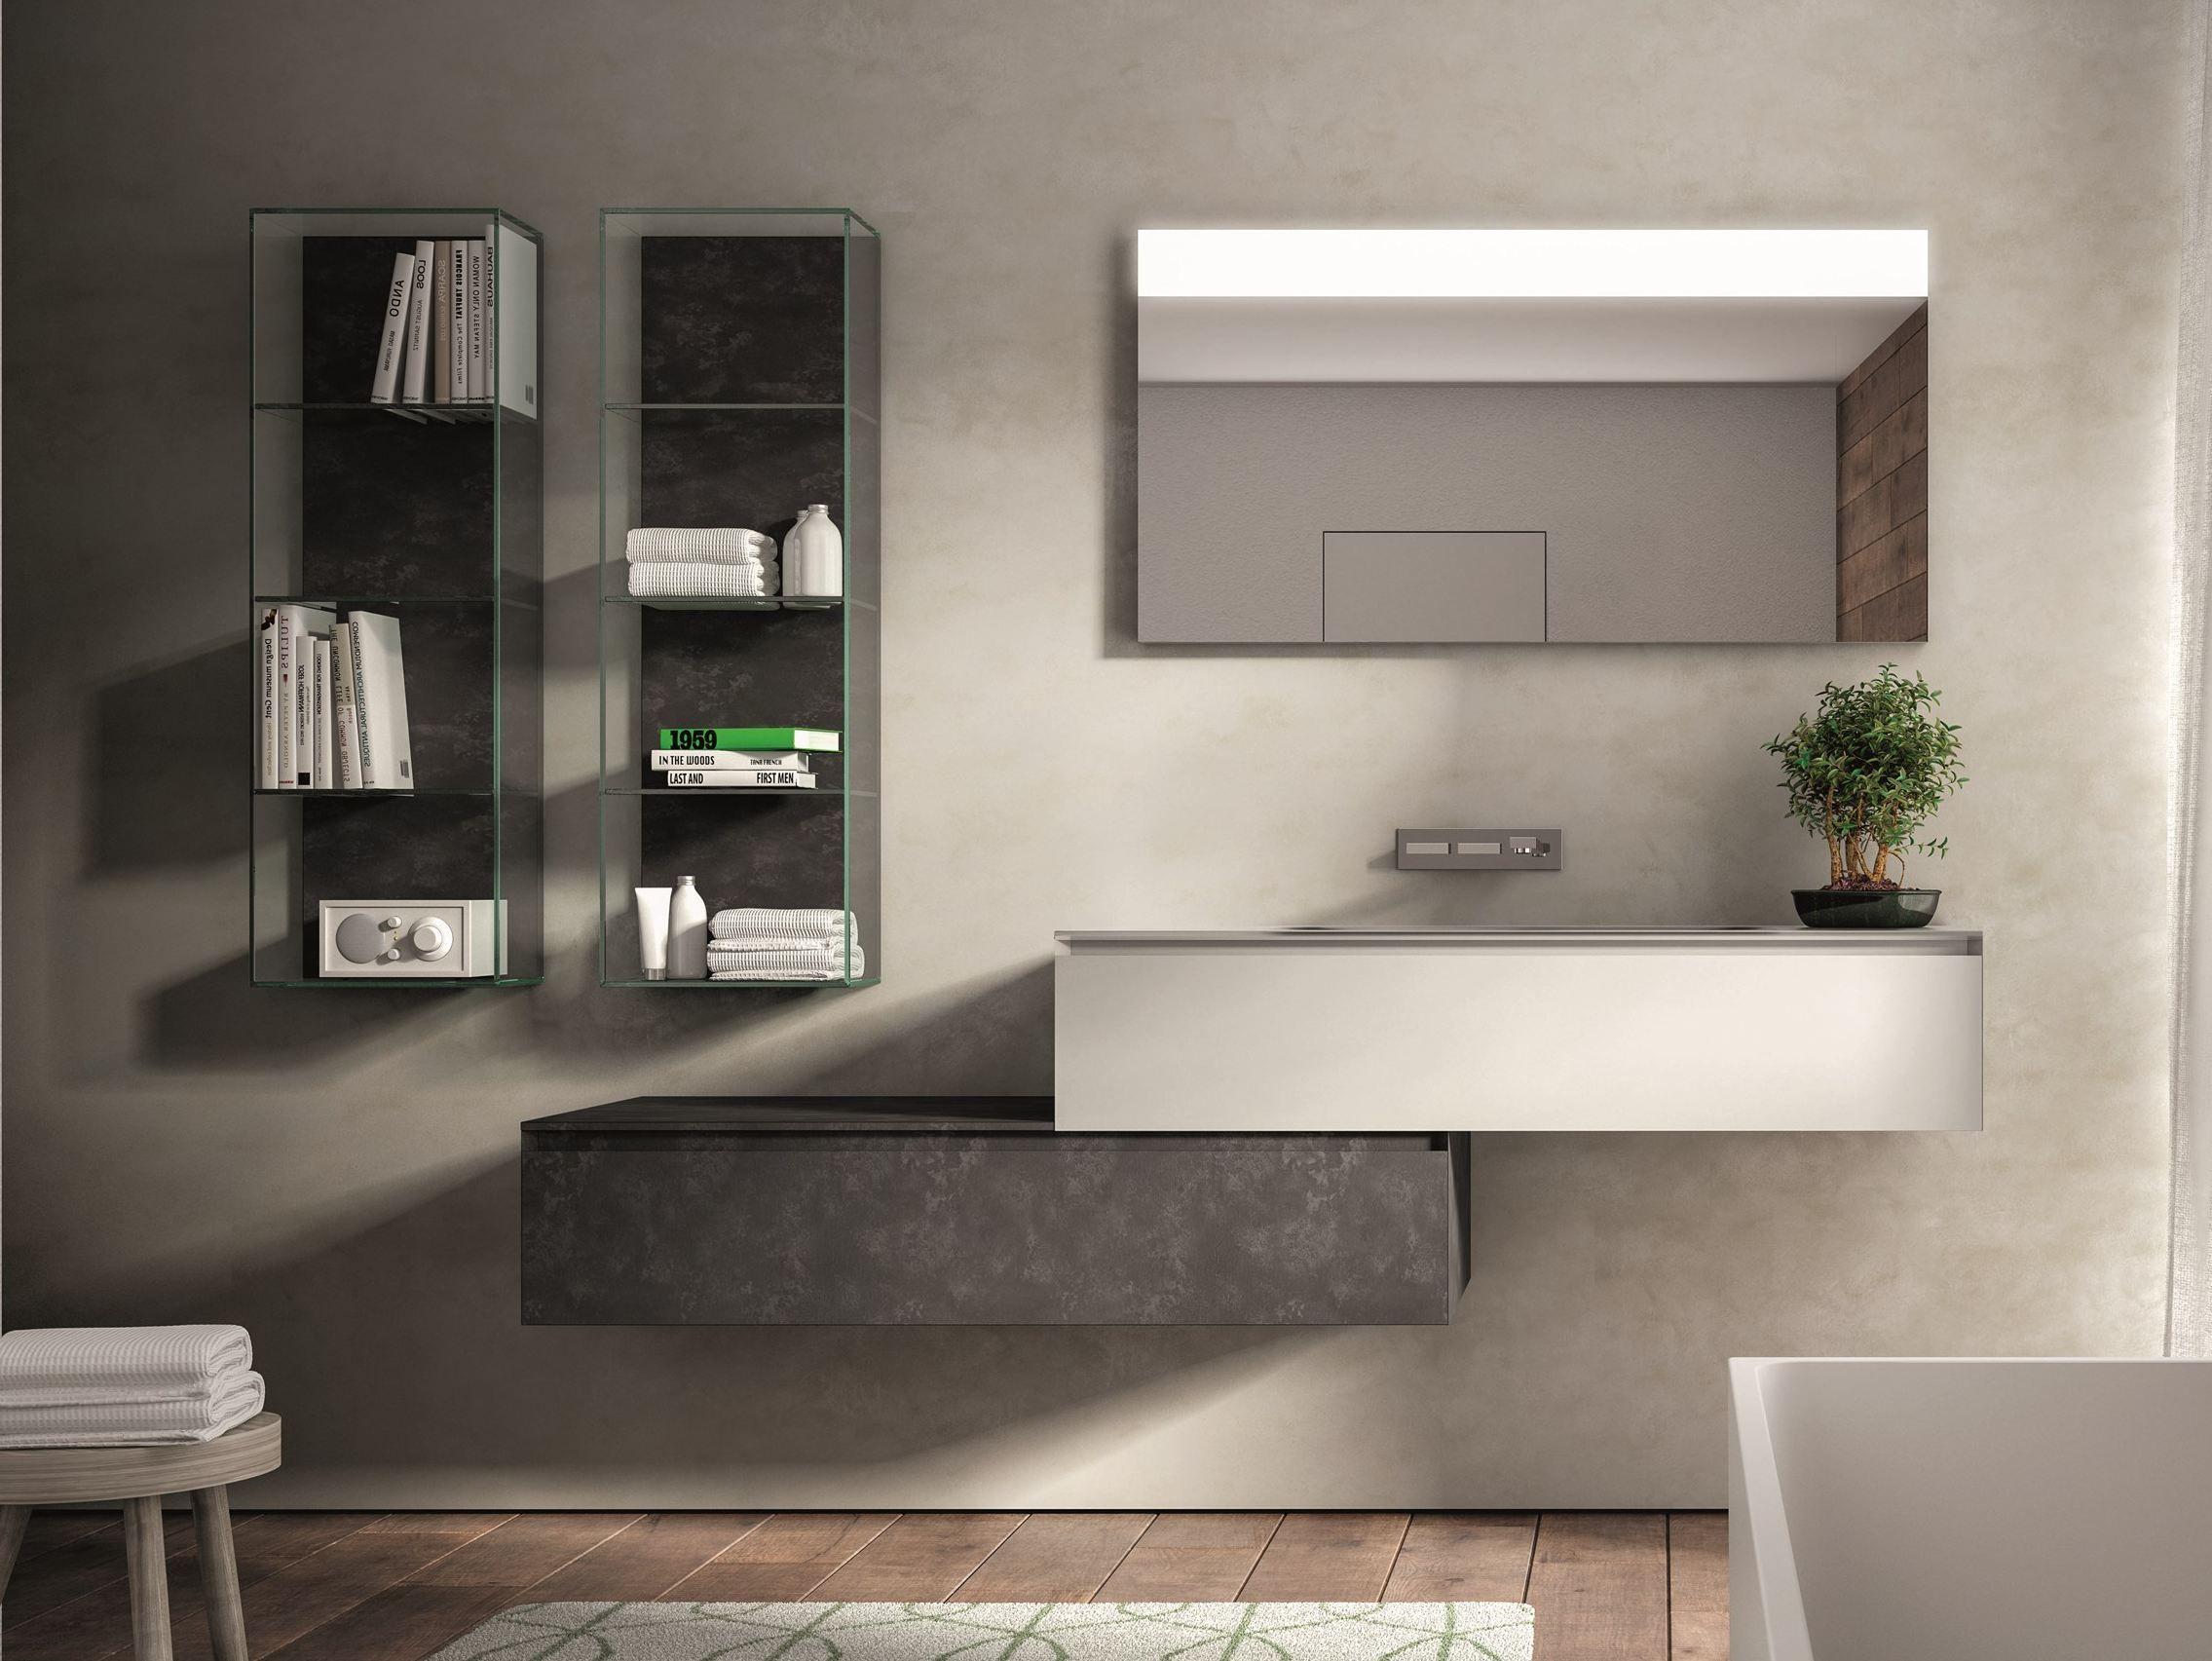 Arredo bagno completo in legno cubik n 11 by ideagroup for Arredo bagno completo